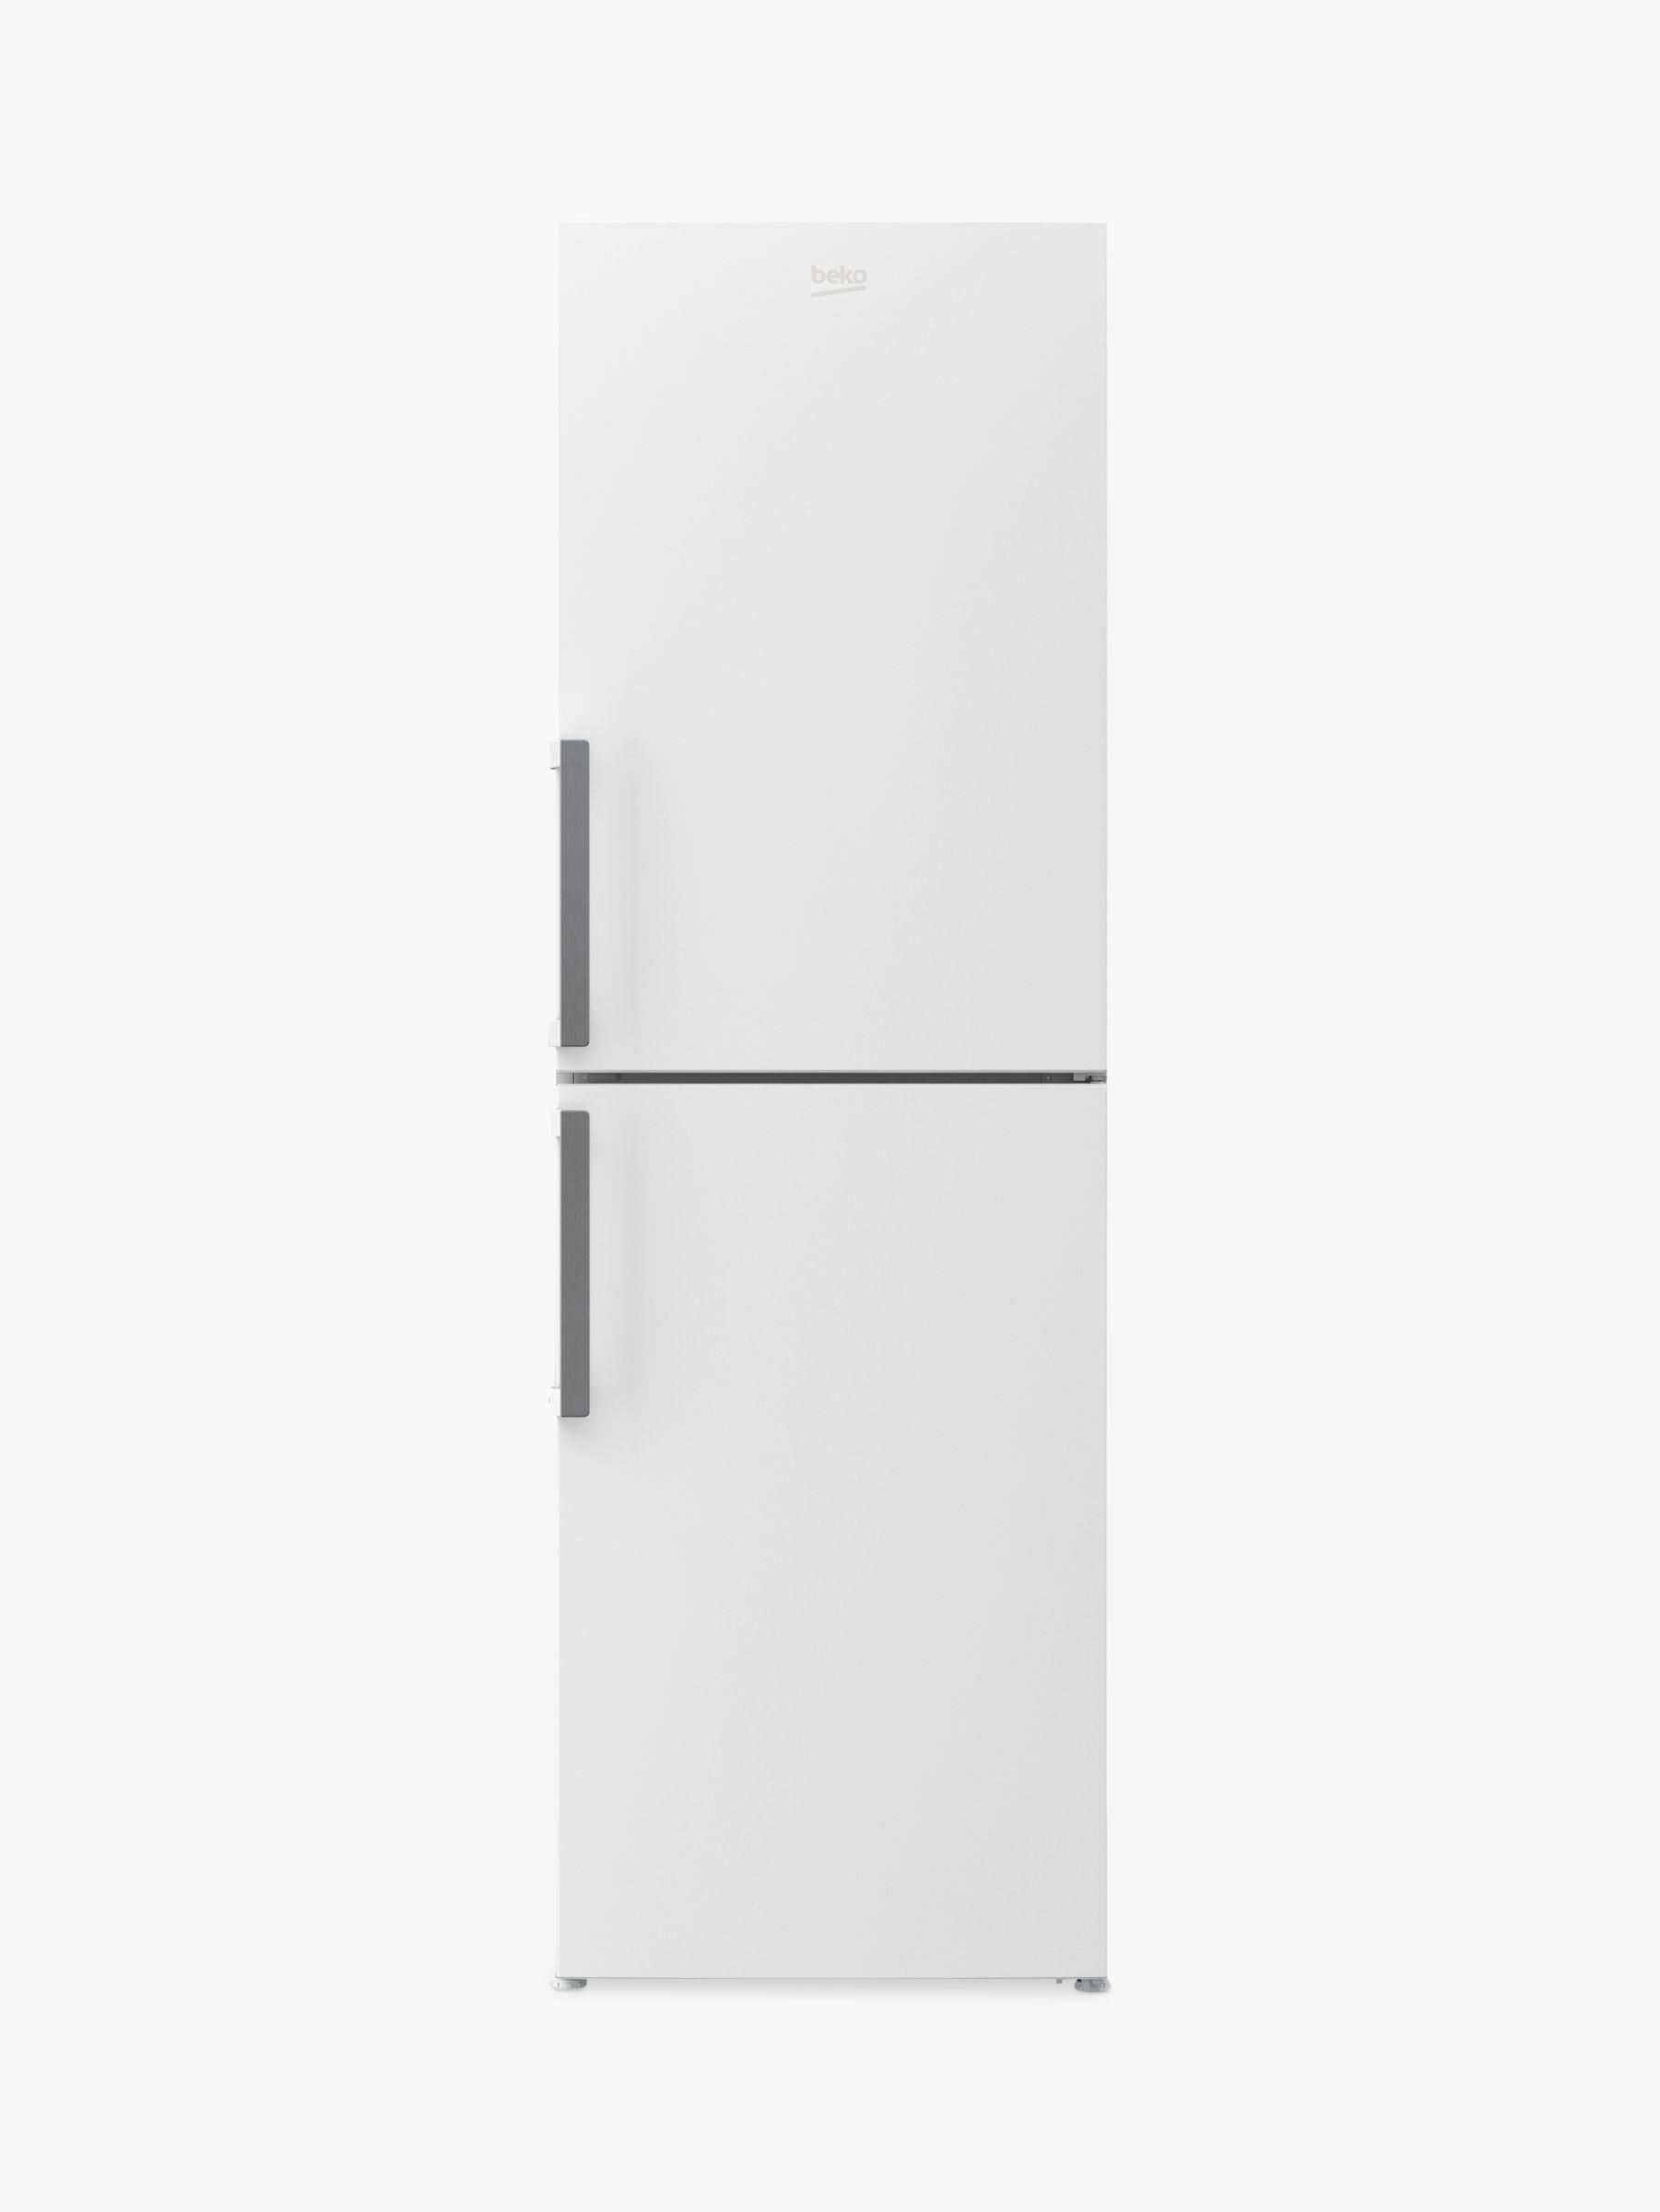 Beko Beko CFP1691W Fridge Freezer, A+ Energy Rating, 60cm Wide, White